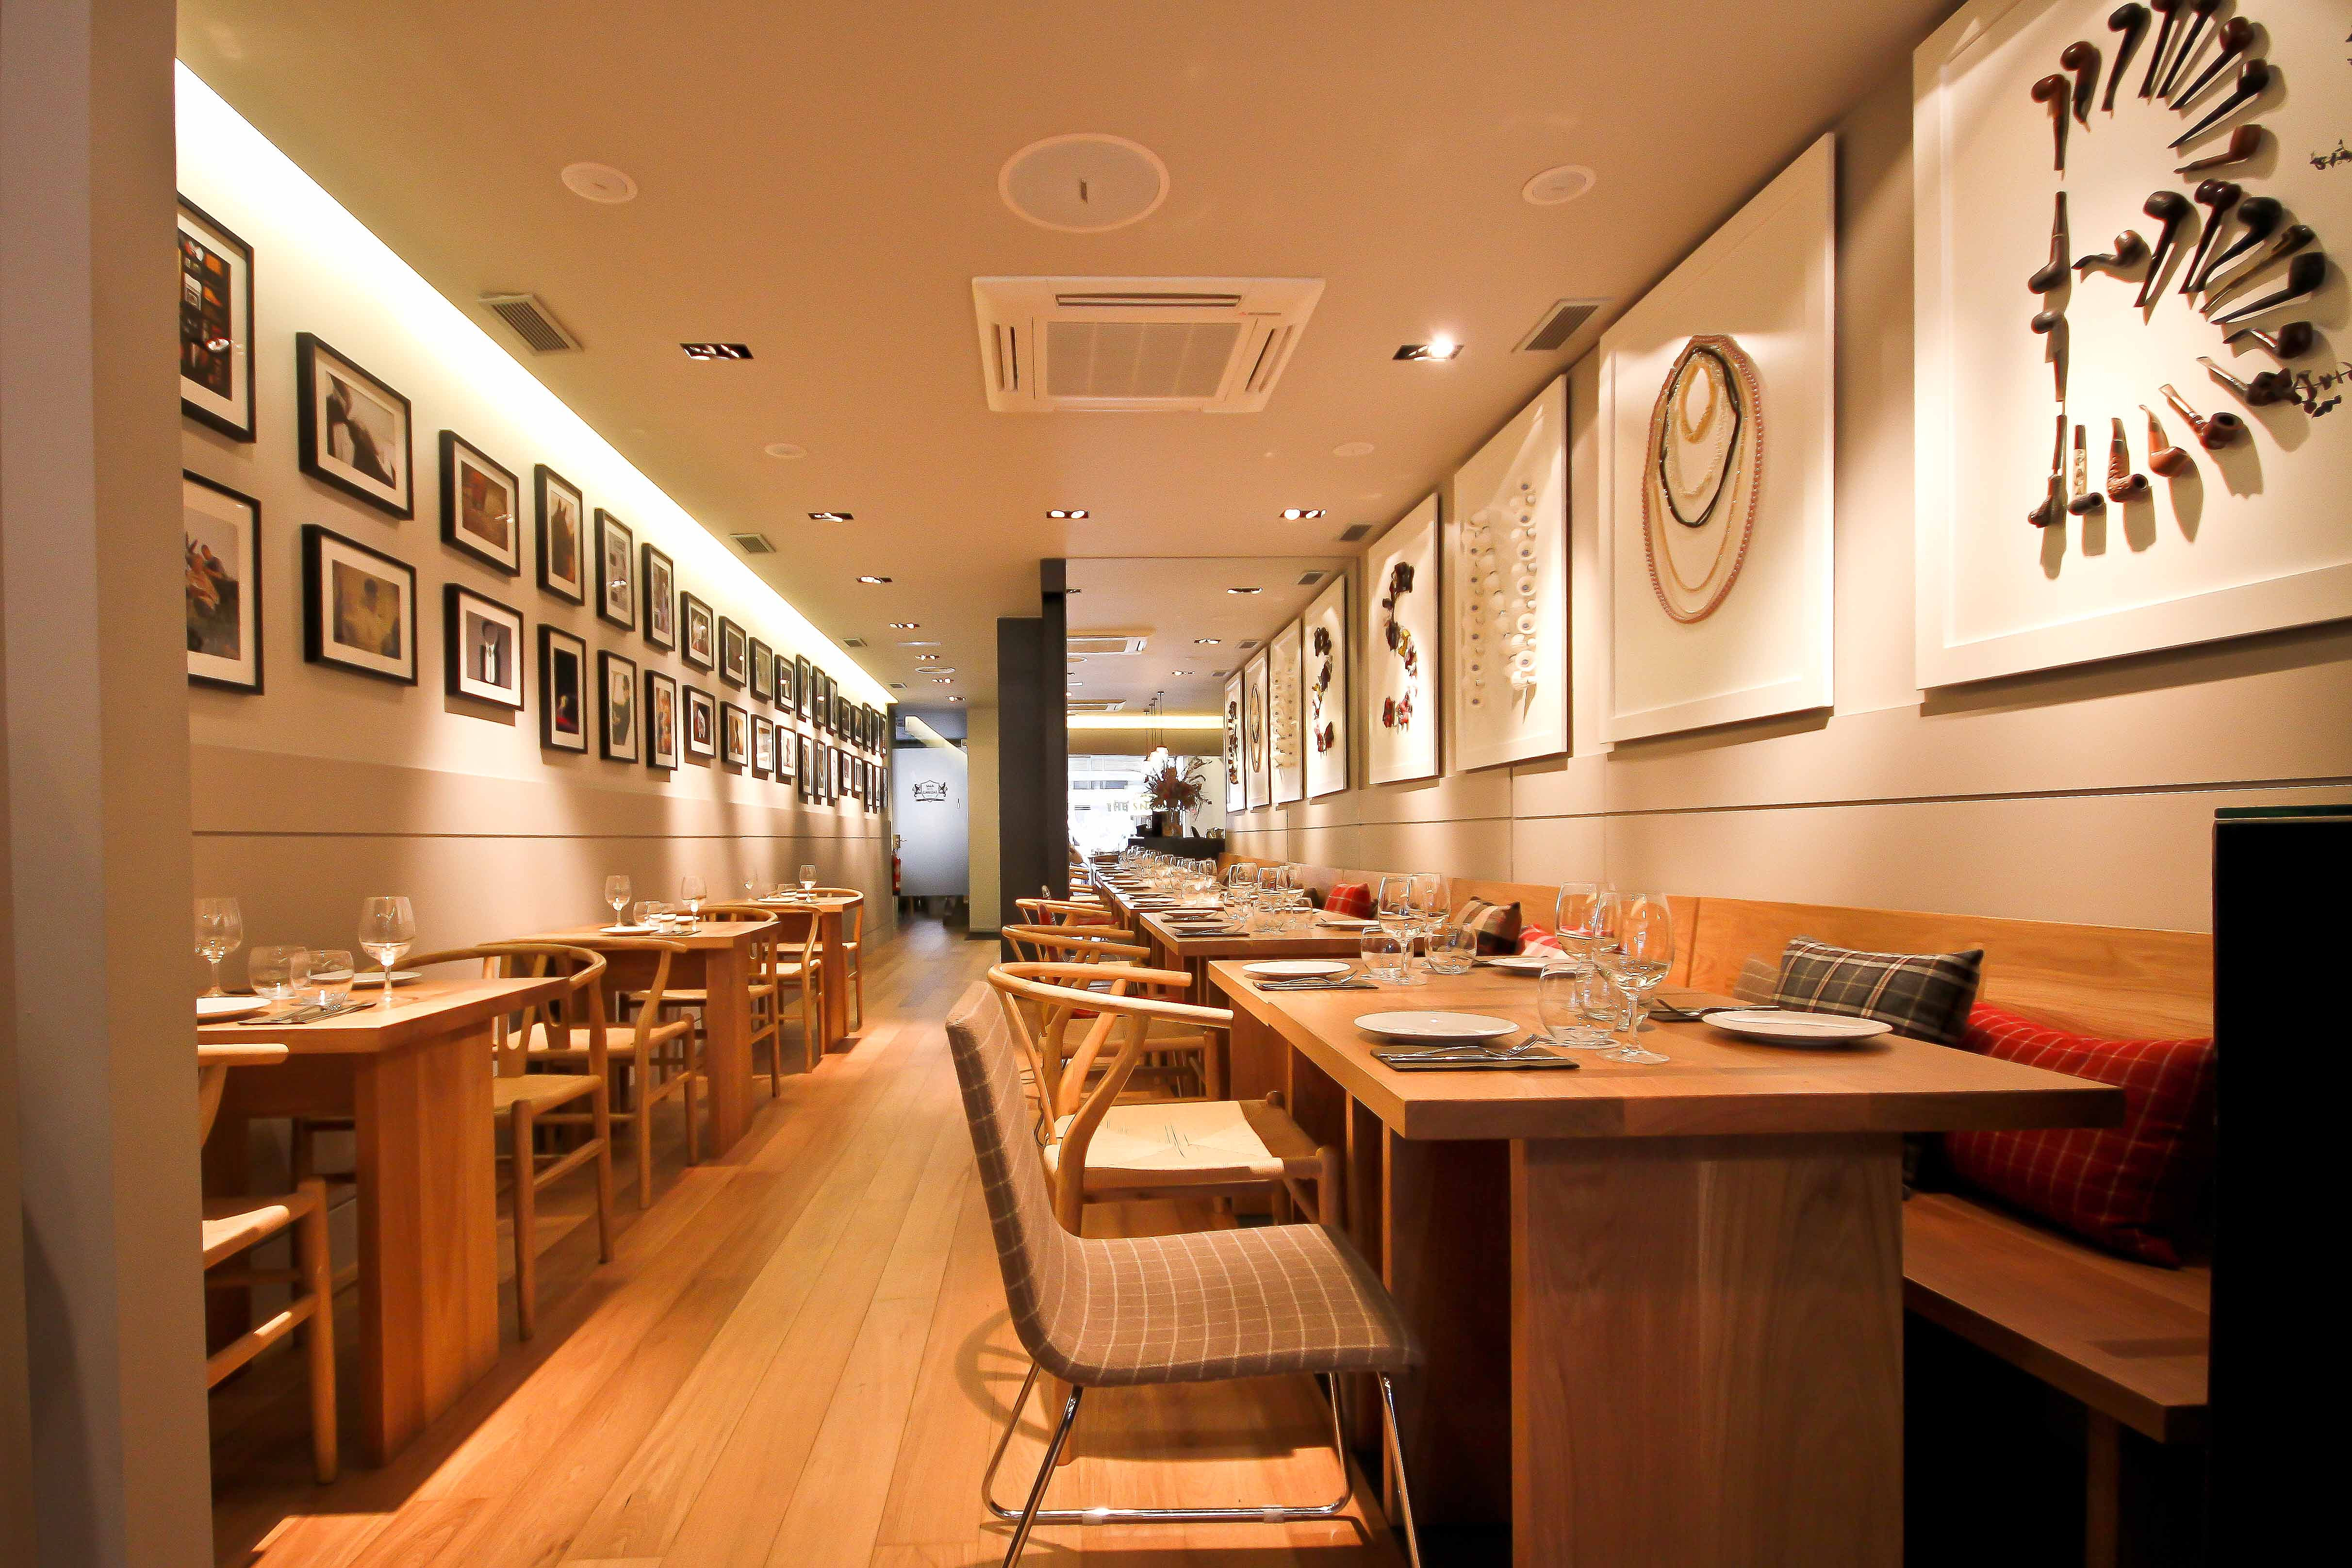 Dise o restaurante the snob - Diseno interiores barcelona ...